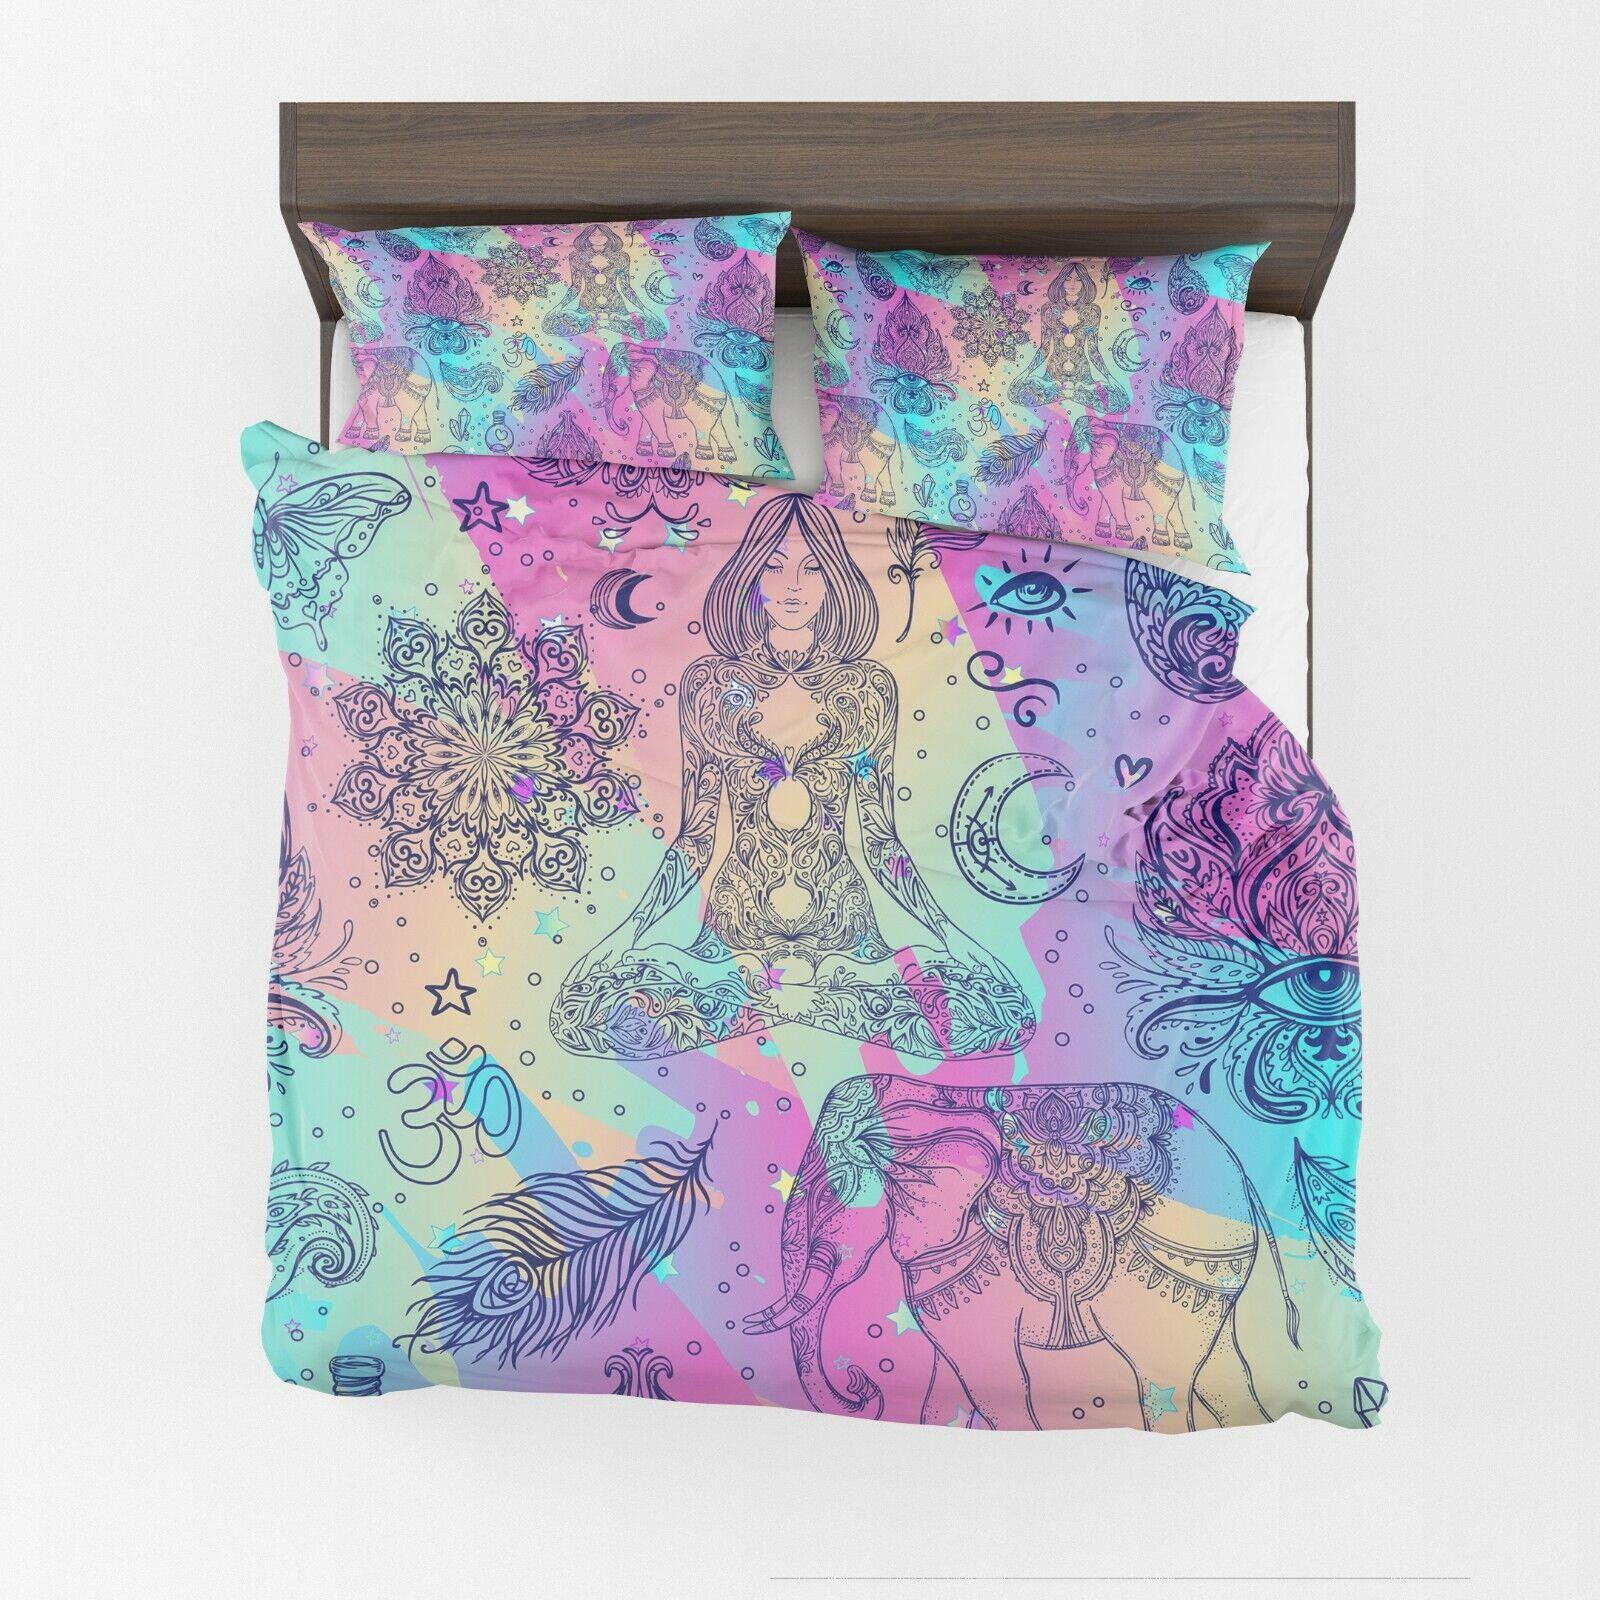 Boho Dreams Comforter or Duvet Cover hippy bedding boho bedding spiritual duvet